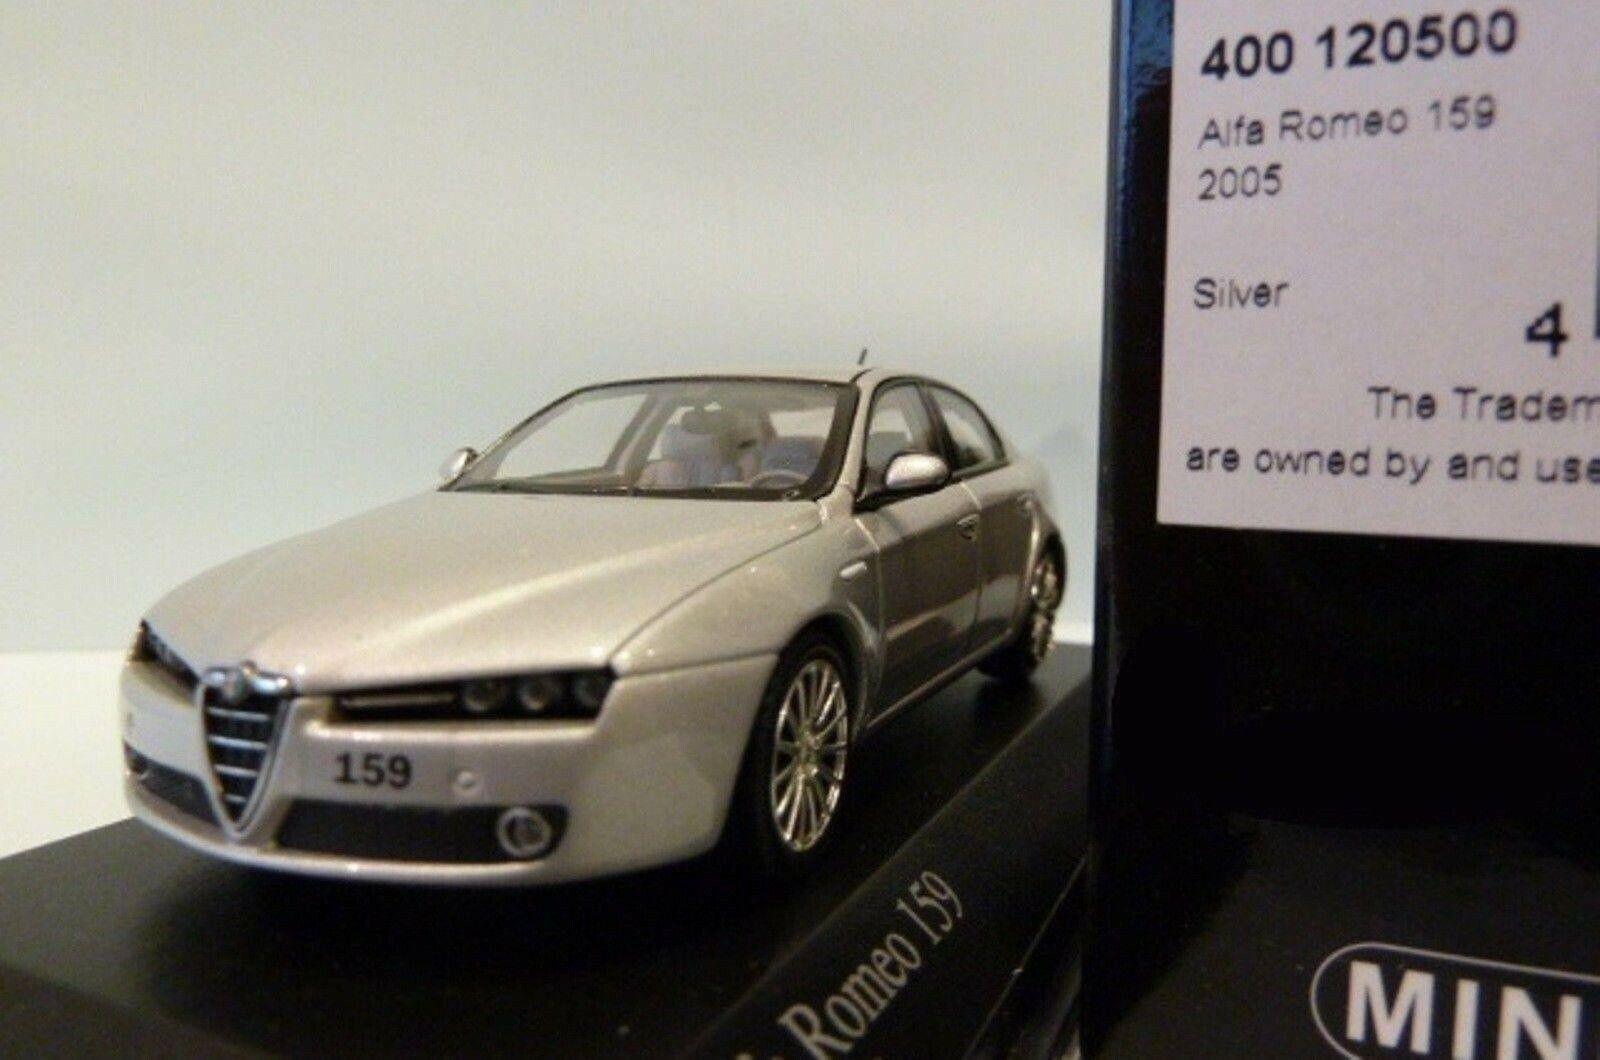 Wow extremadonnate raro de Alfa Romeo 159 Sedan 3.2 V6 Q4 2005 argento 1 43 Minichamps-GT